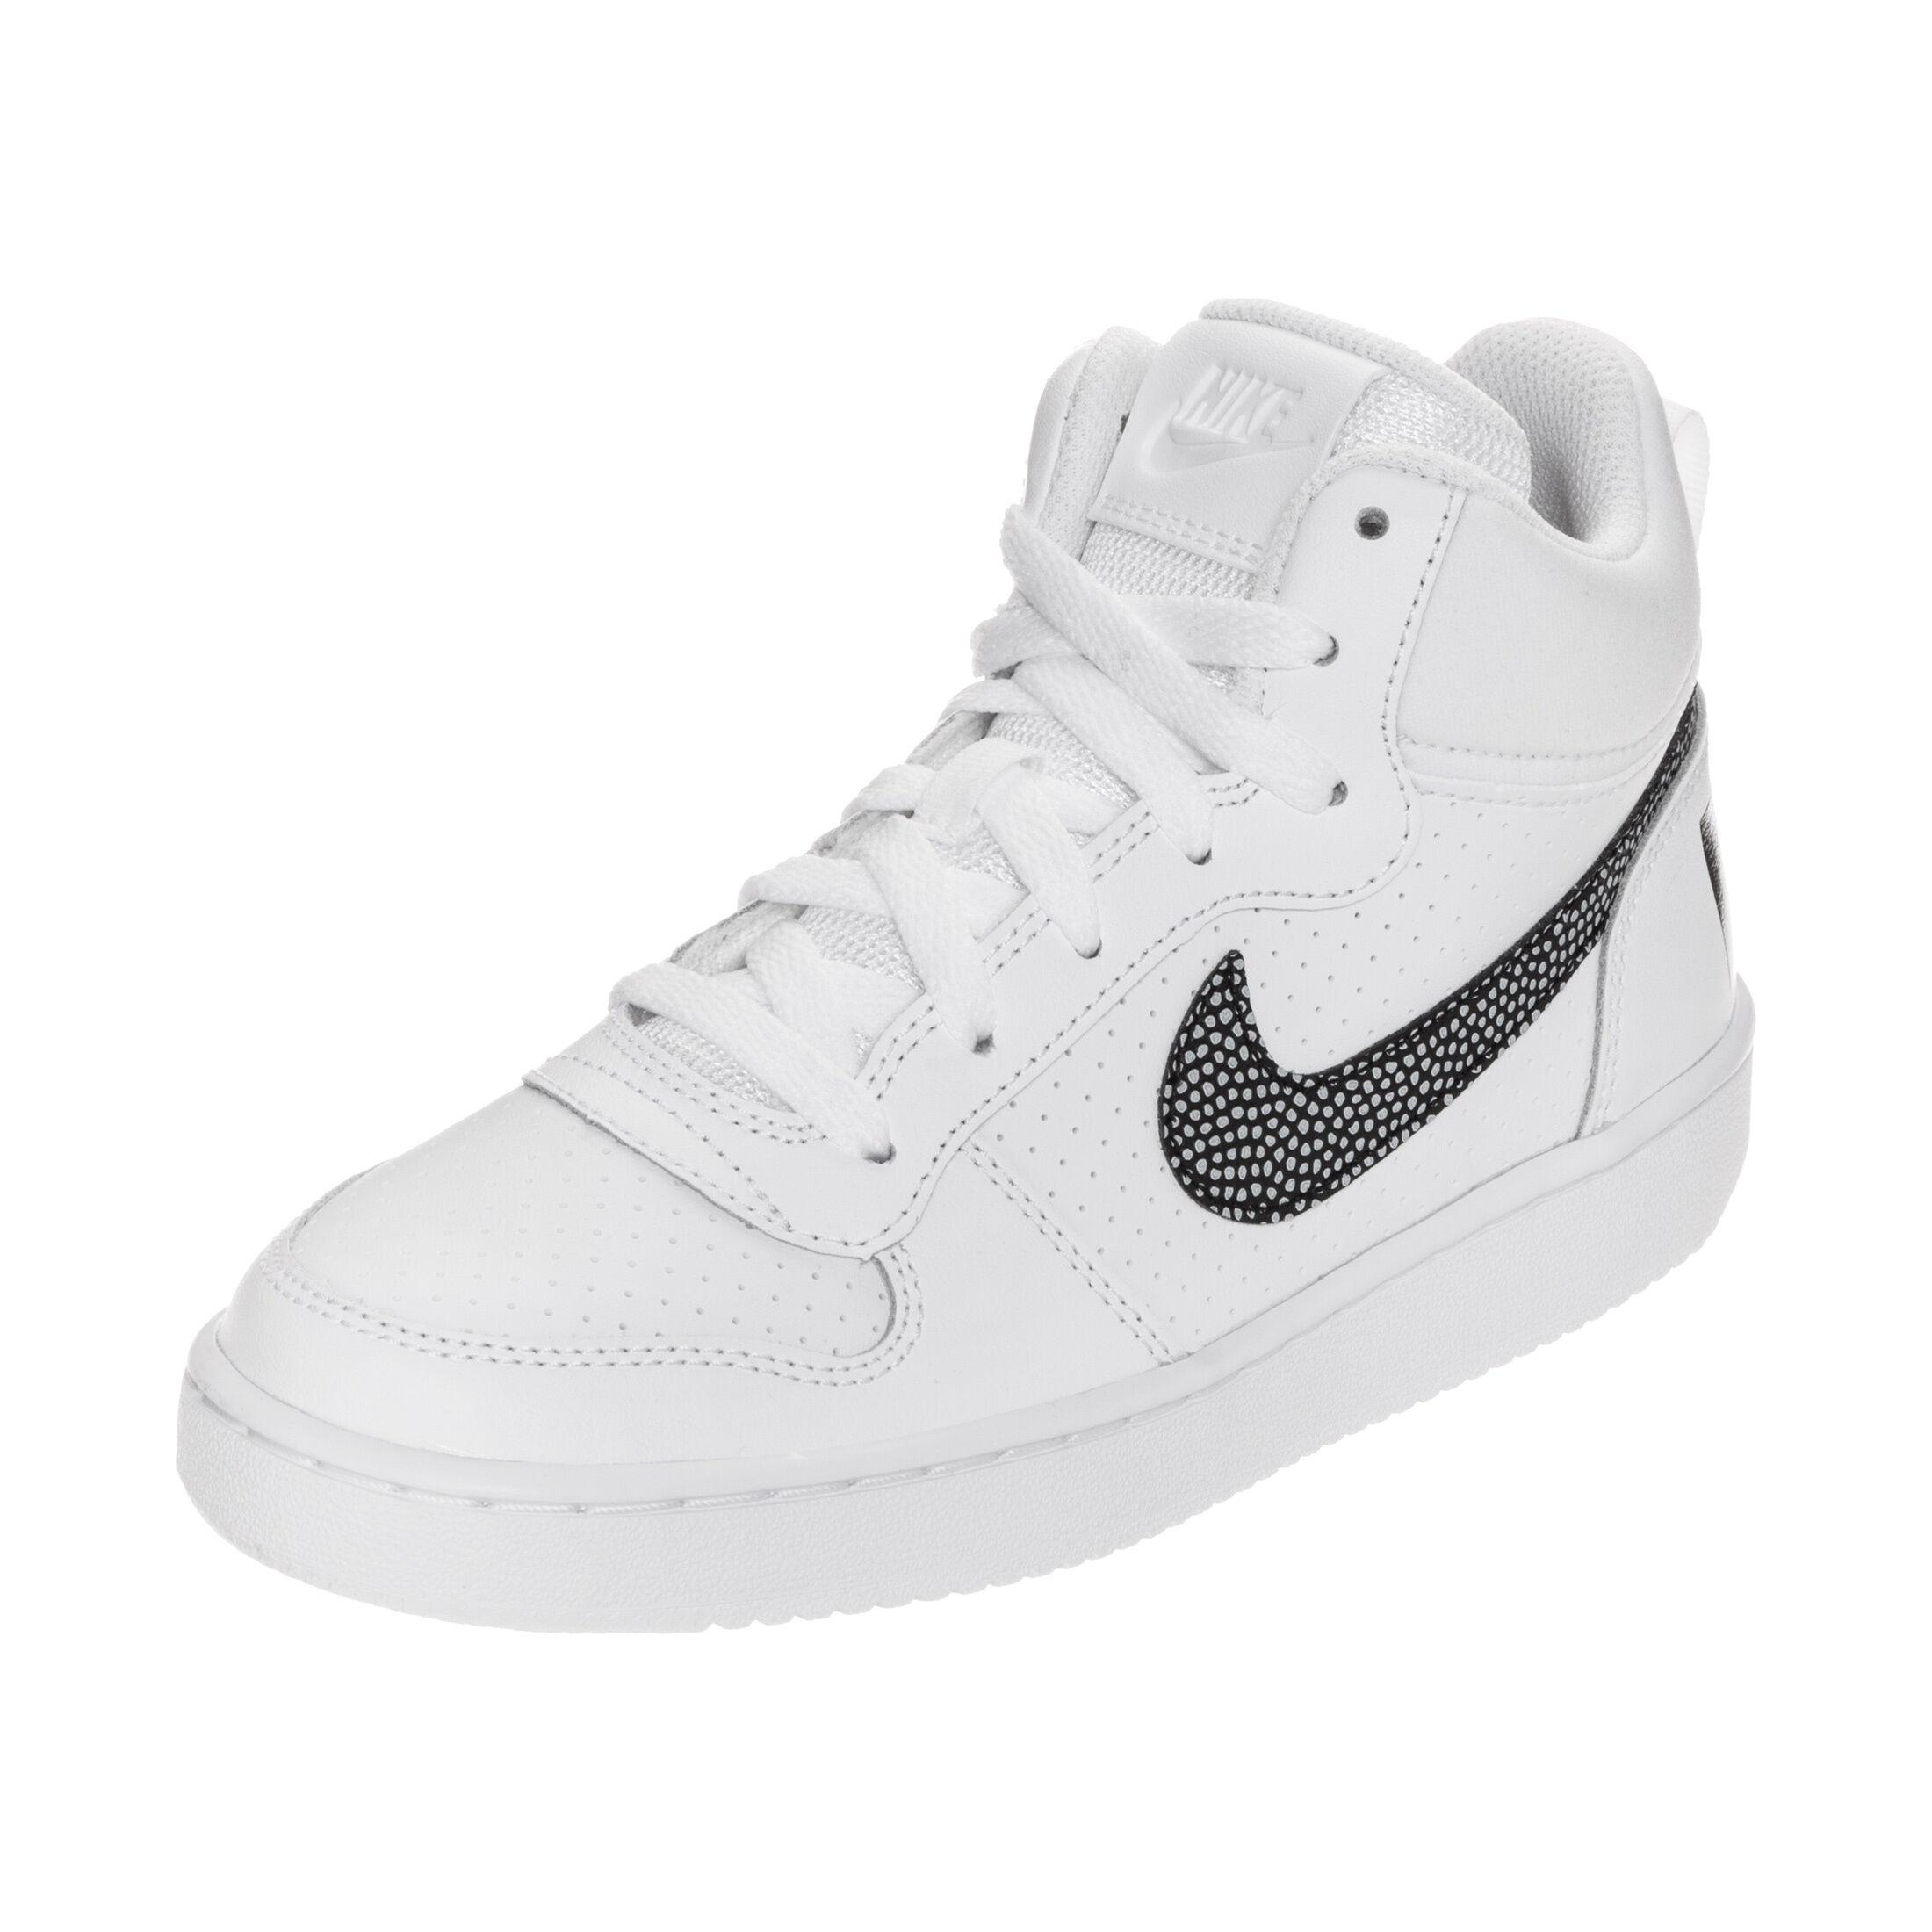 Nike Sportswear Court Borough Mid Sneaker Kinder sWQyZ9ib